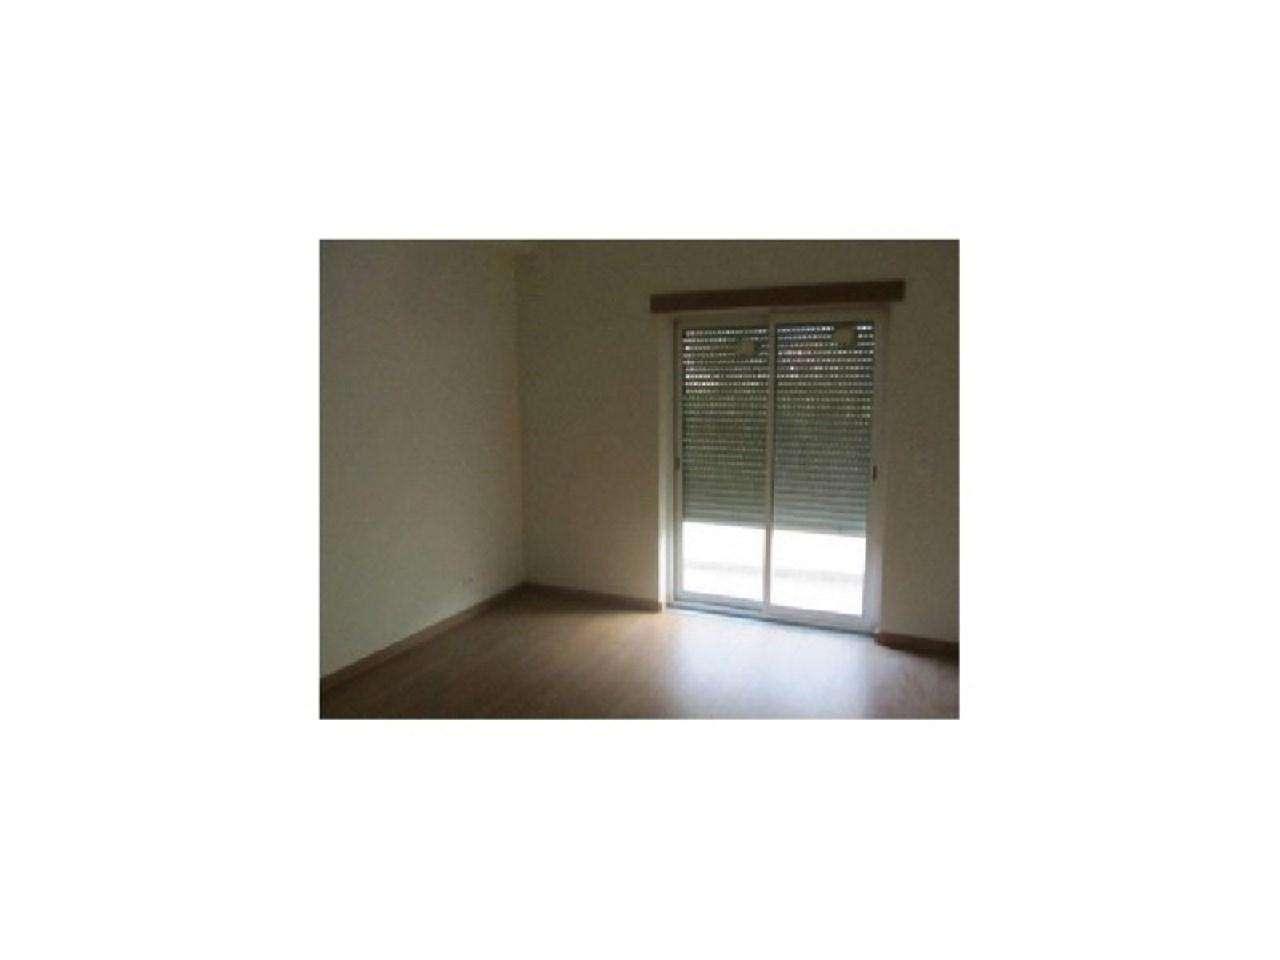 Apartamento para comprar, Caria, Castelo Branco - Foto 2